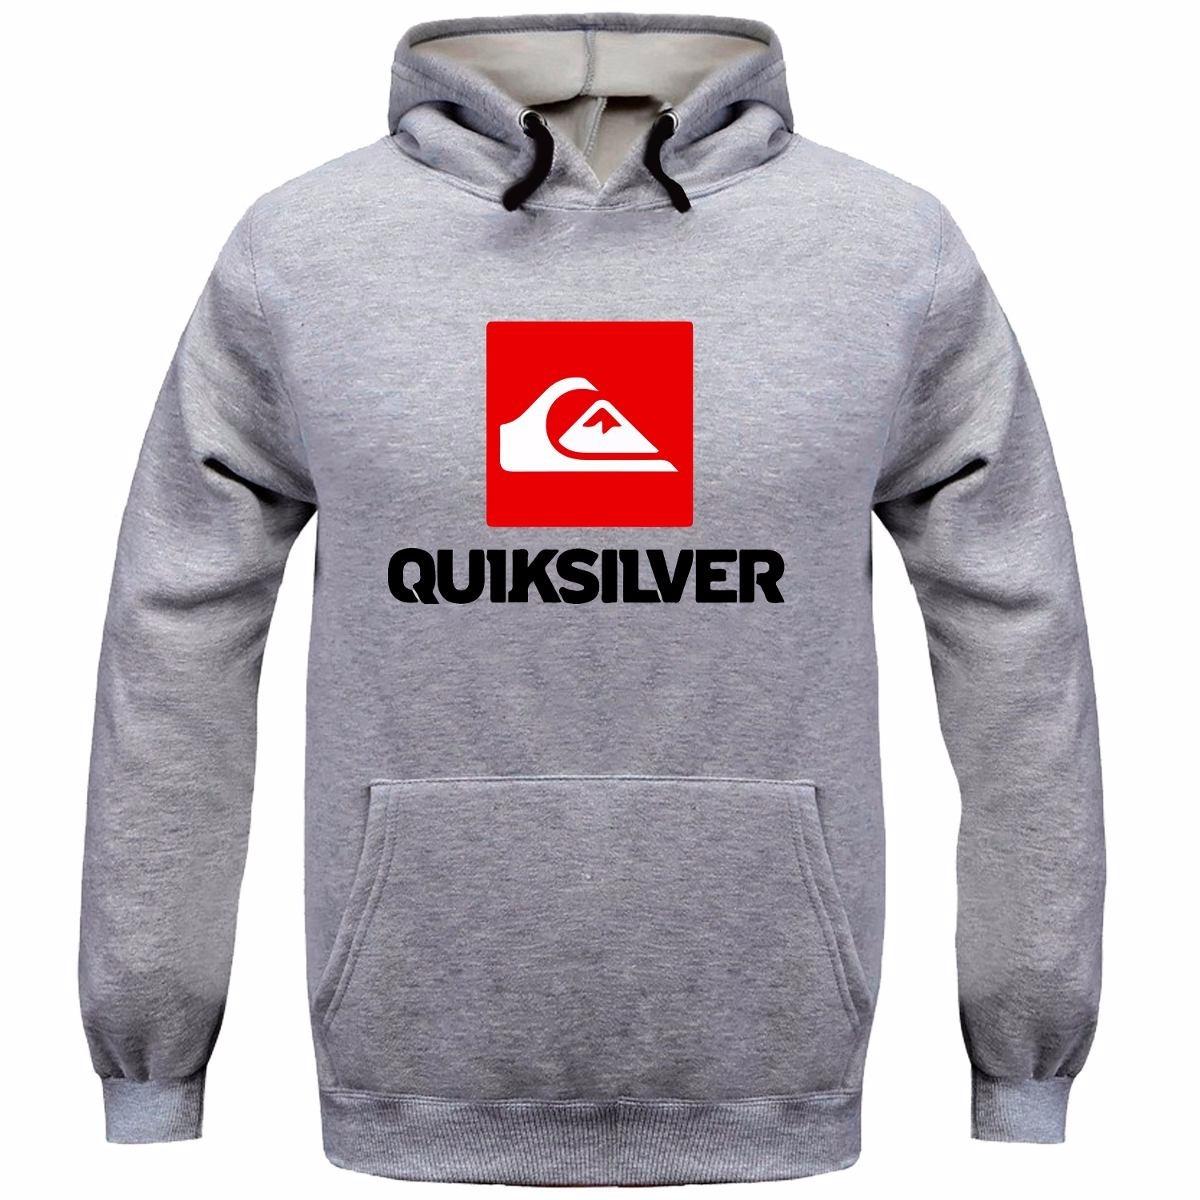 blusa moleton quiksilver skate surf masculino e feminino sk8. Carregando  zoom. 74694a5ed8